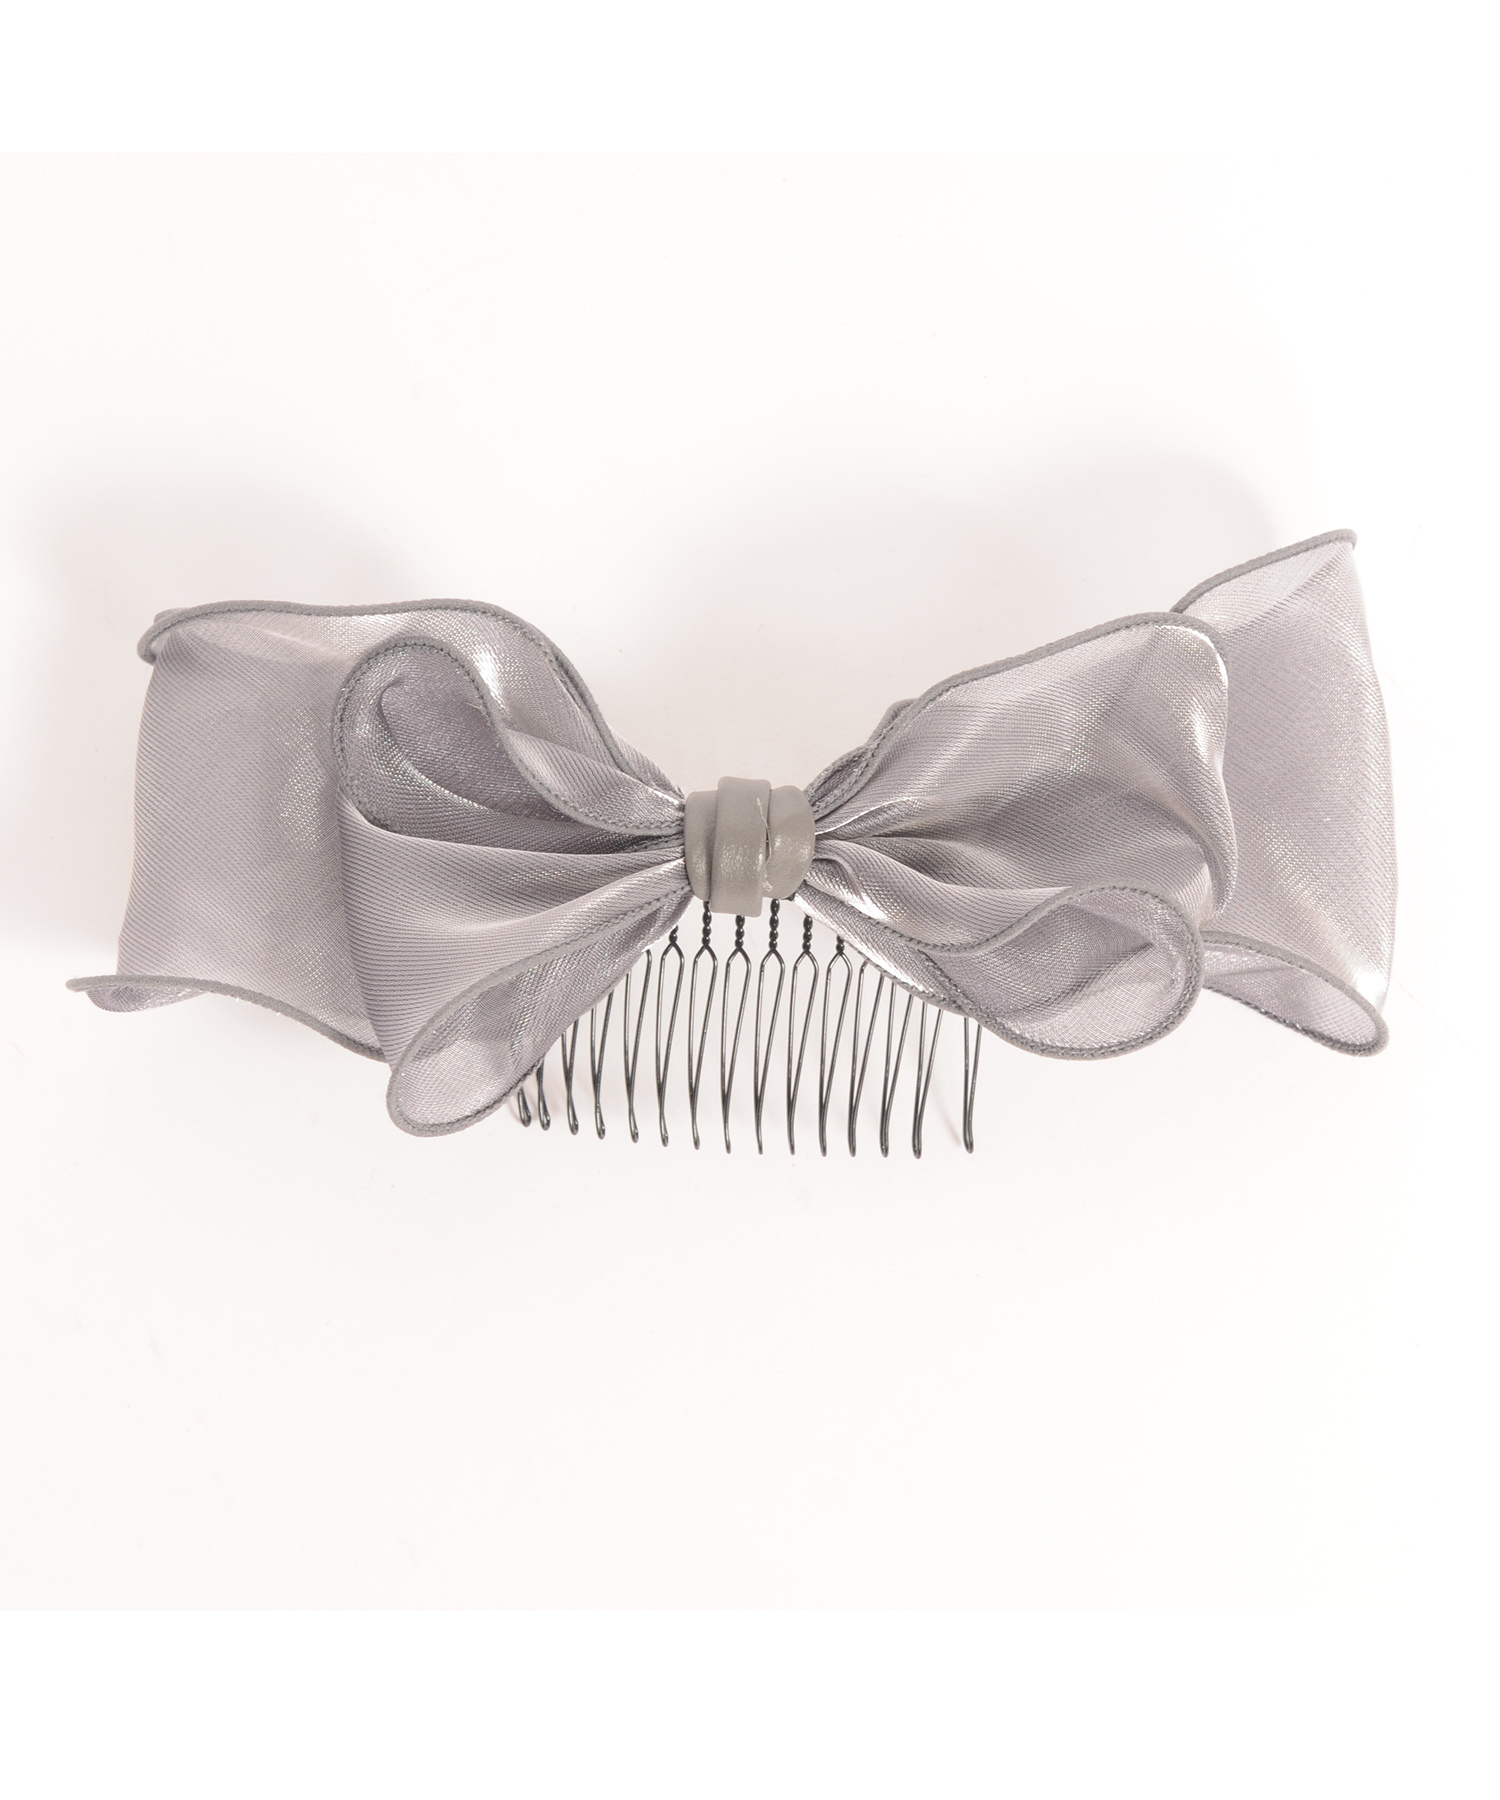 Joe19AW-19 sheer ribbon comb (gray)